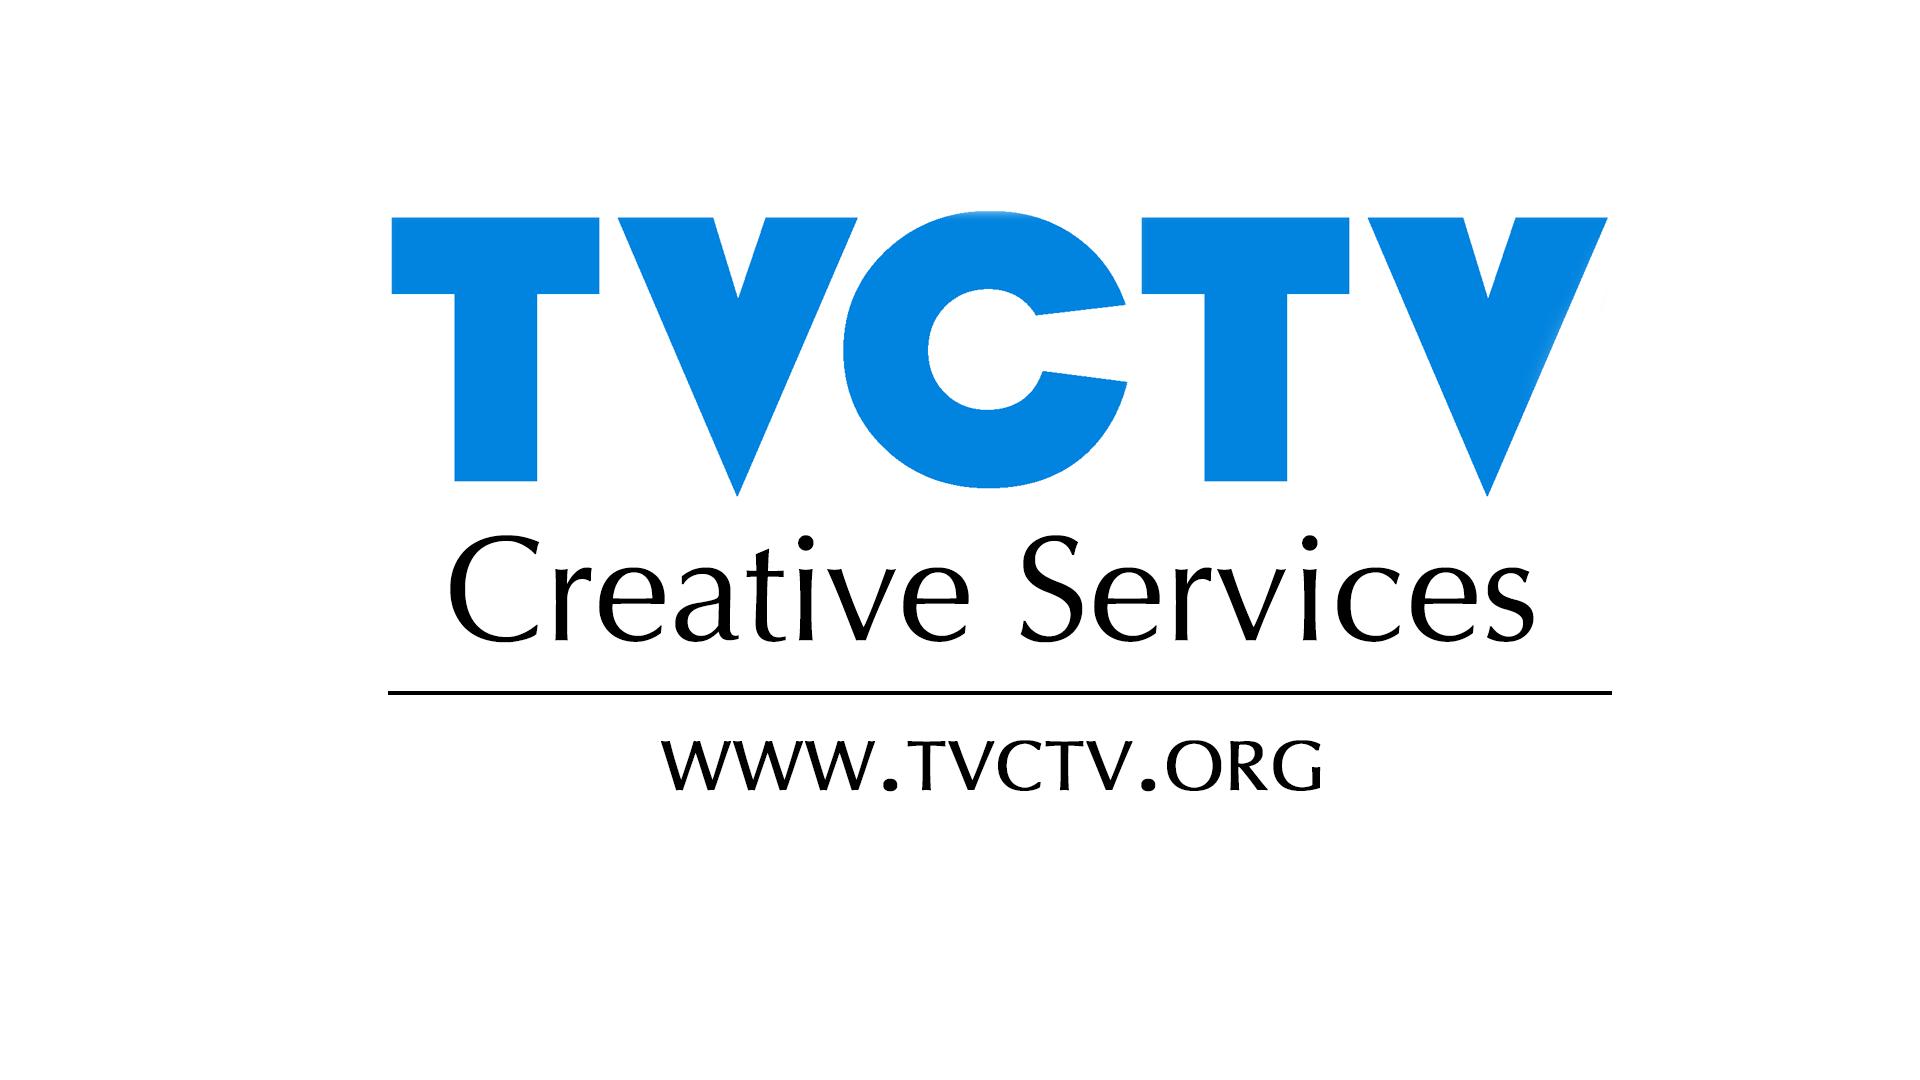 TVCTV logo